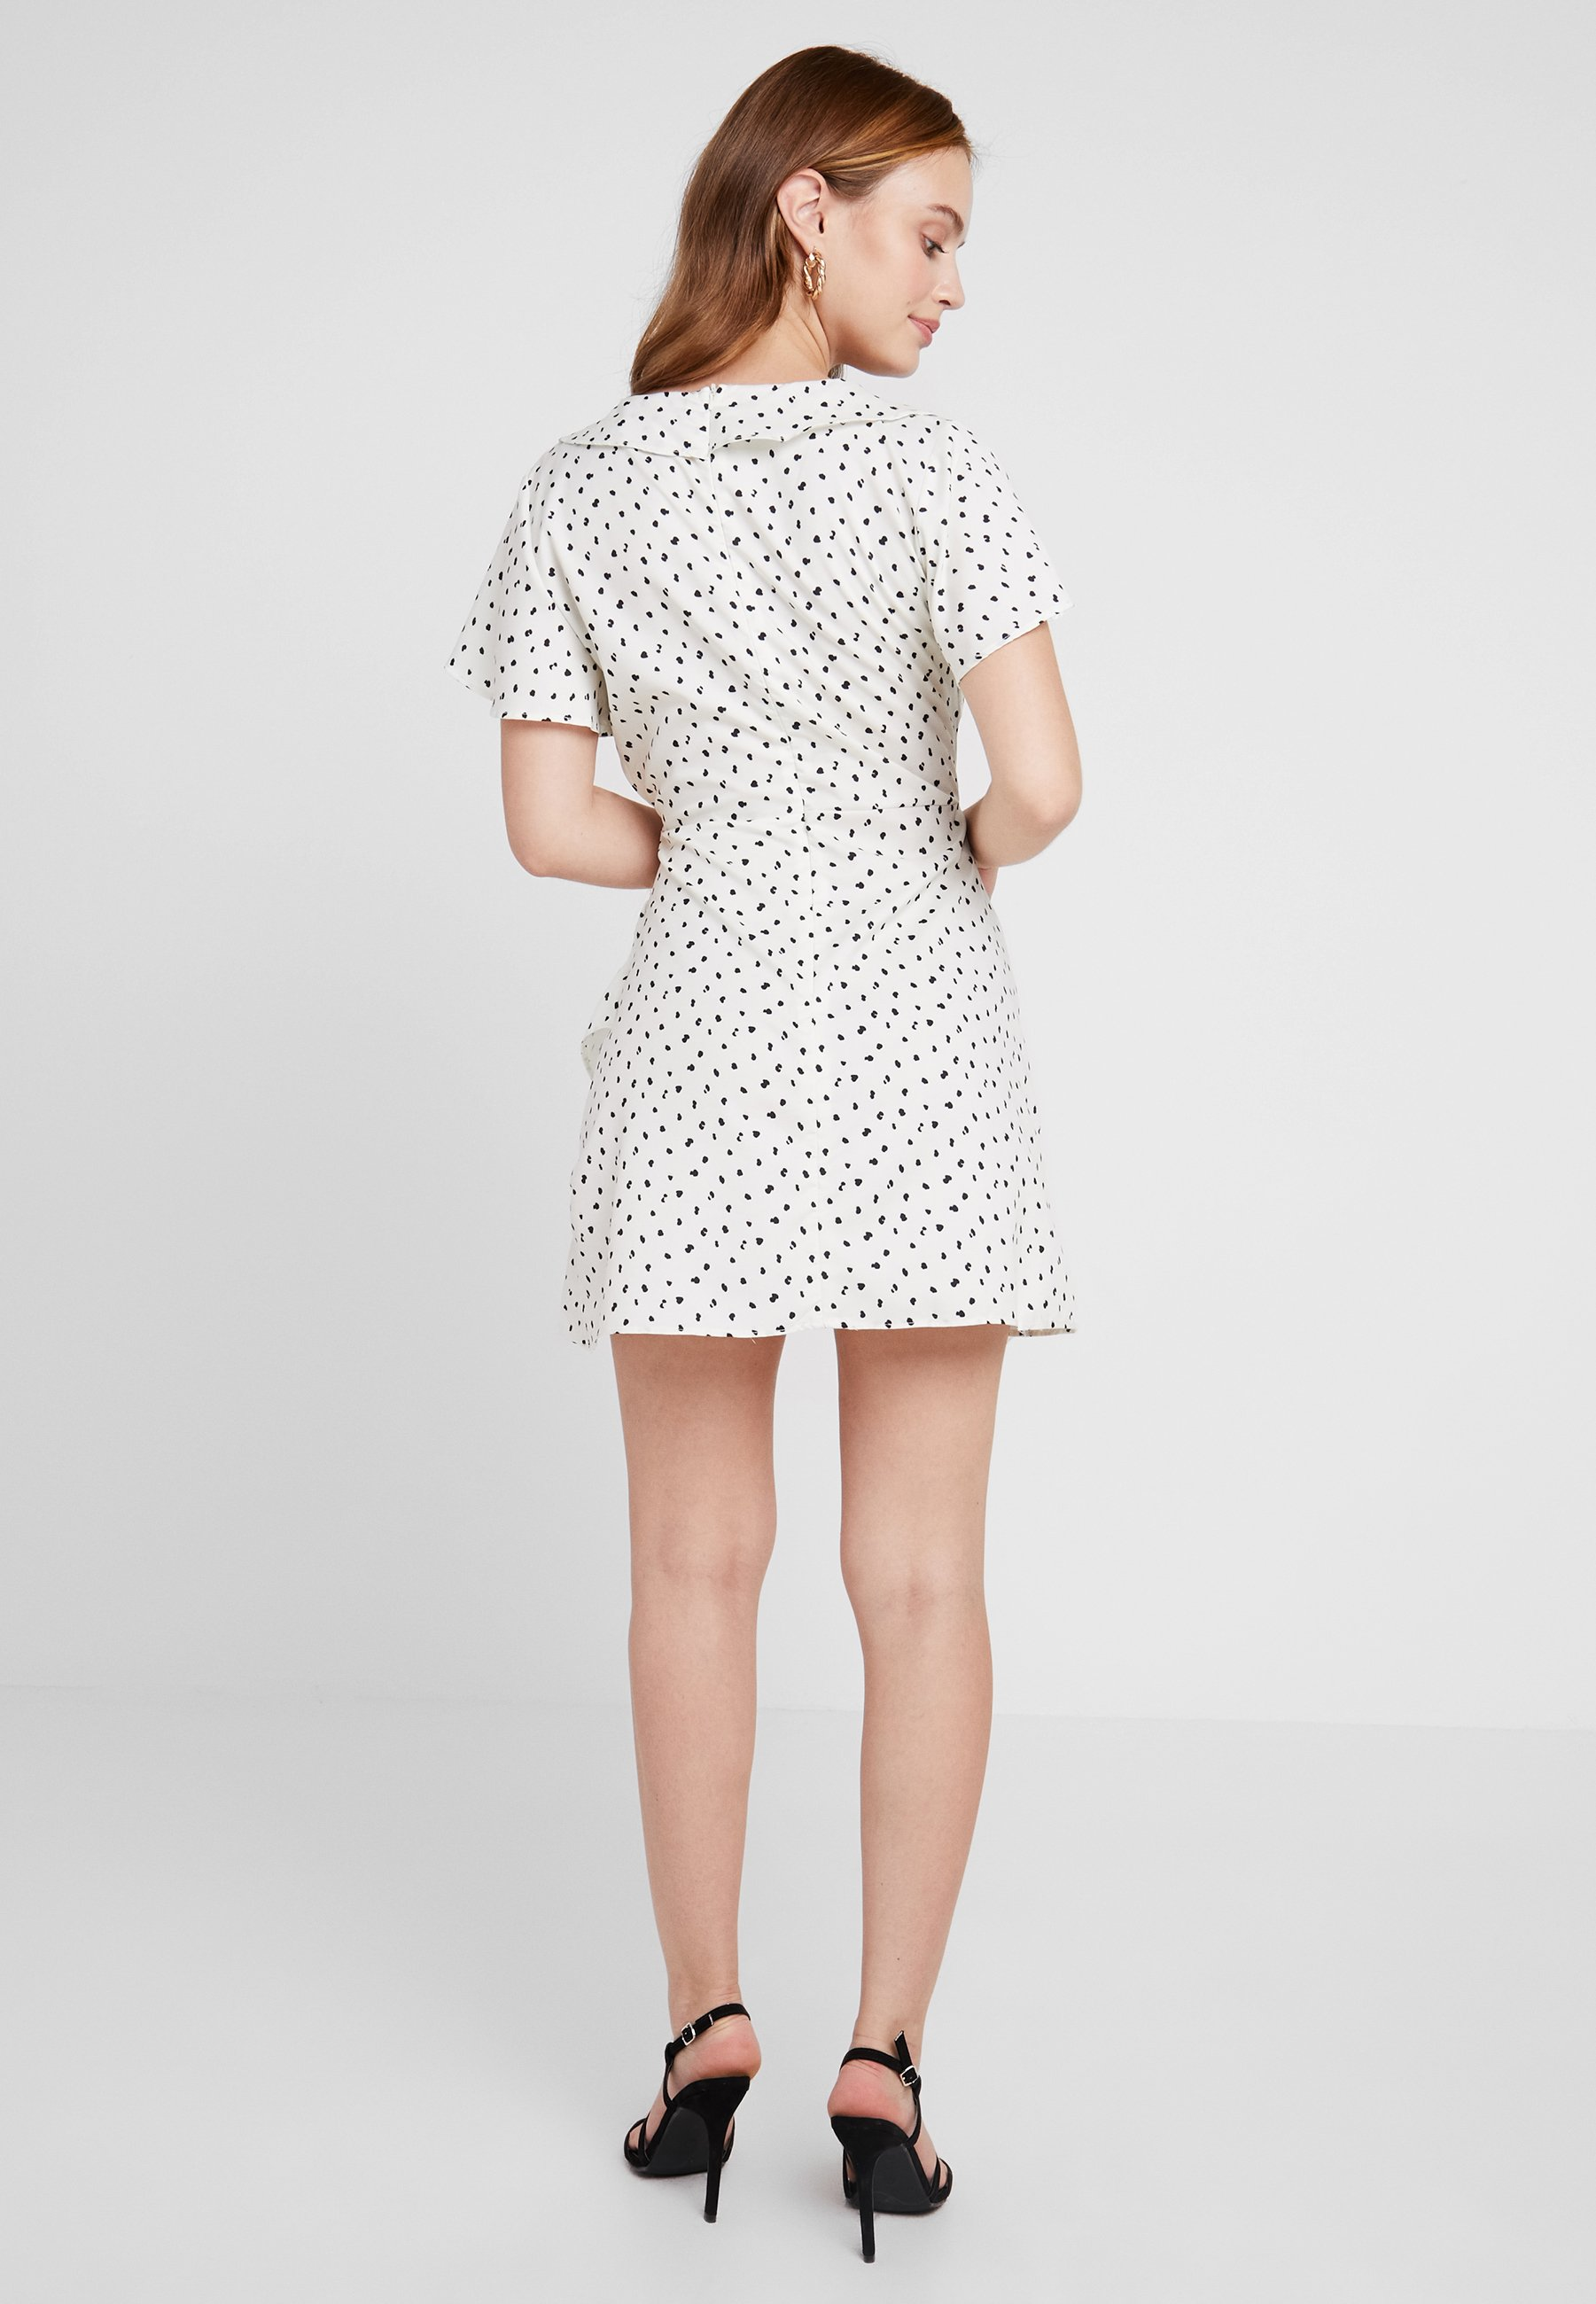 Frill D'été Missguided Spot DressRobe Petite Print Wrap Cream WEH2D9I